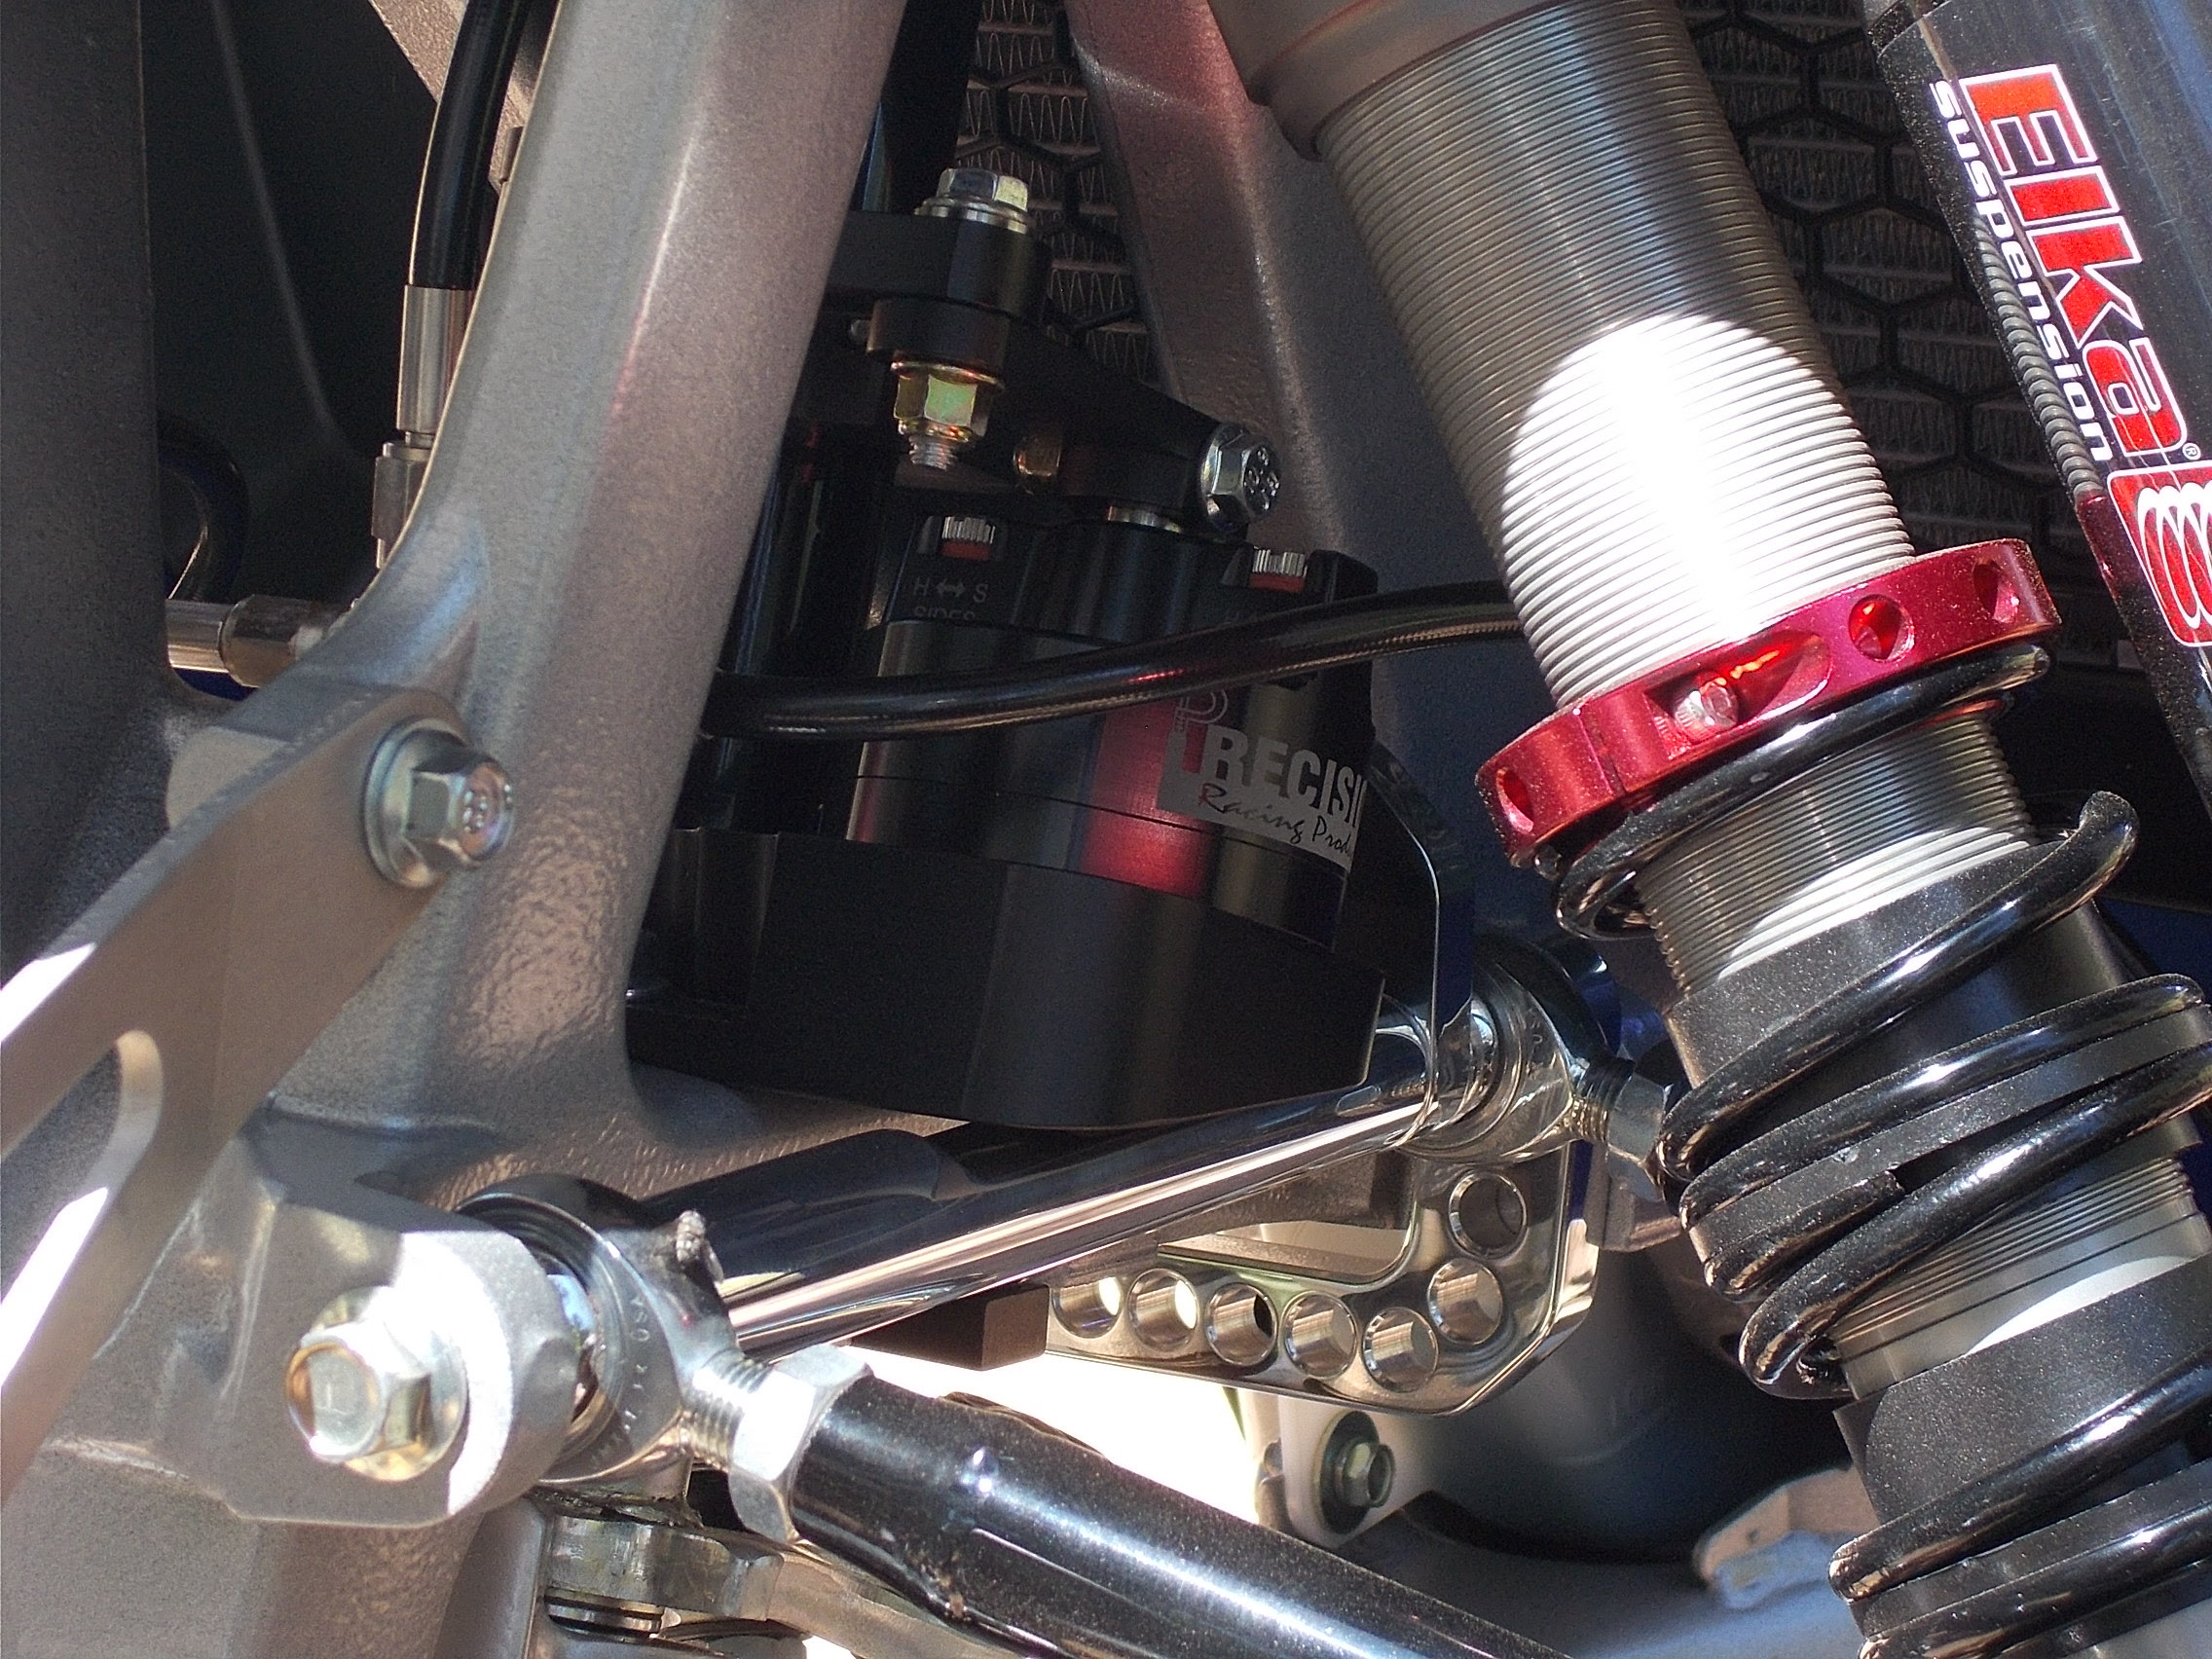 Kilroy s YFZ 450R Trail Bike Build Yamaha YFZ450 Forum YFZ450